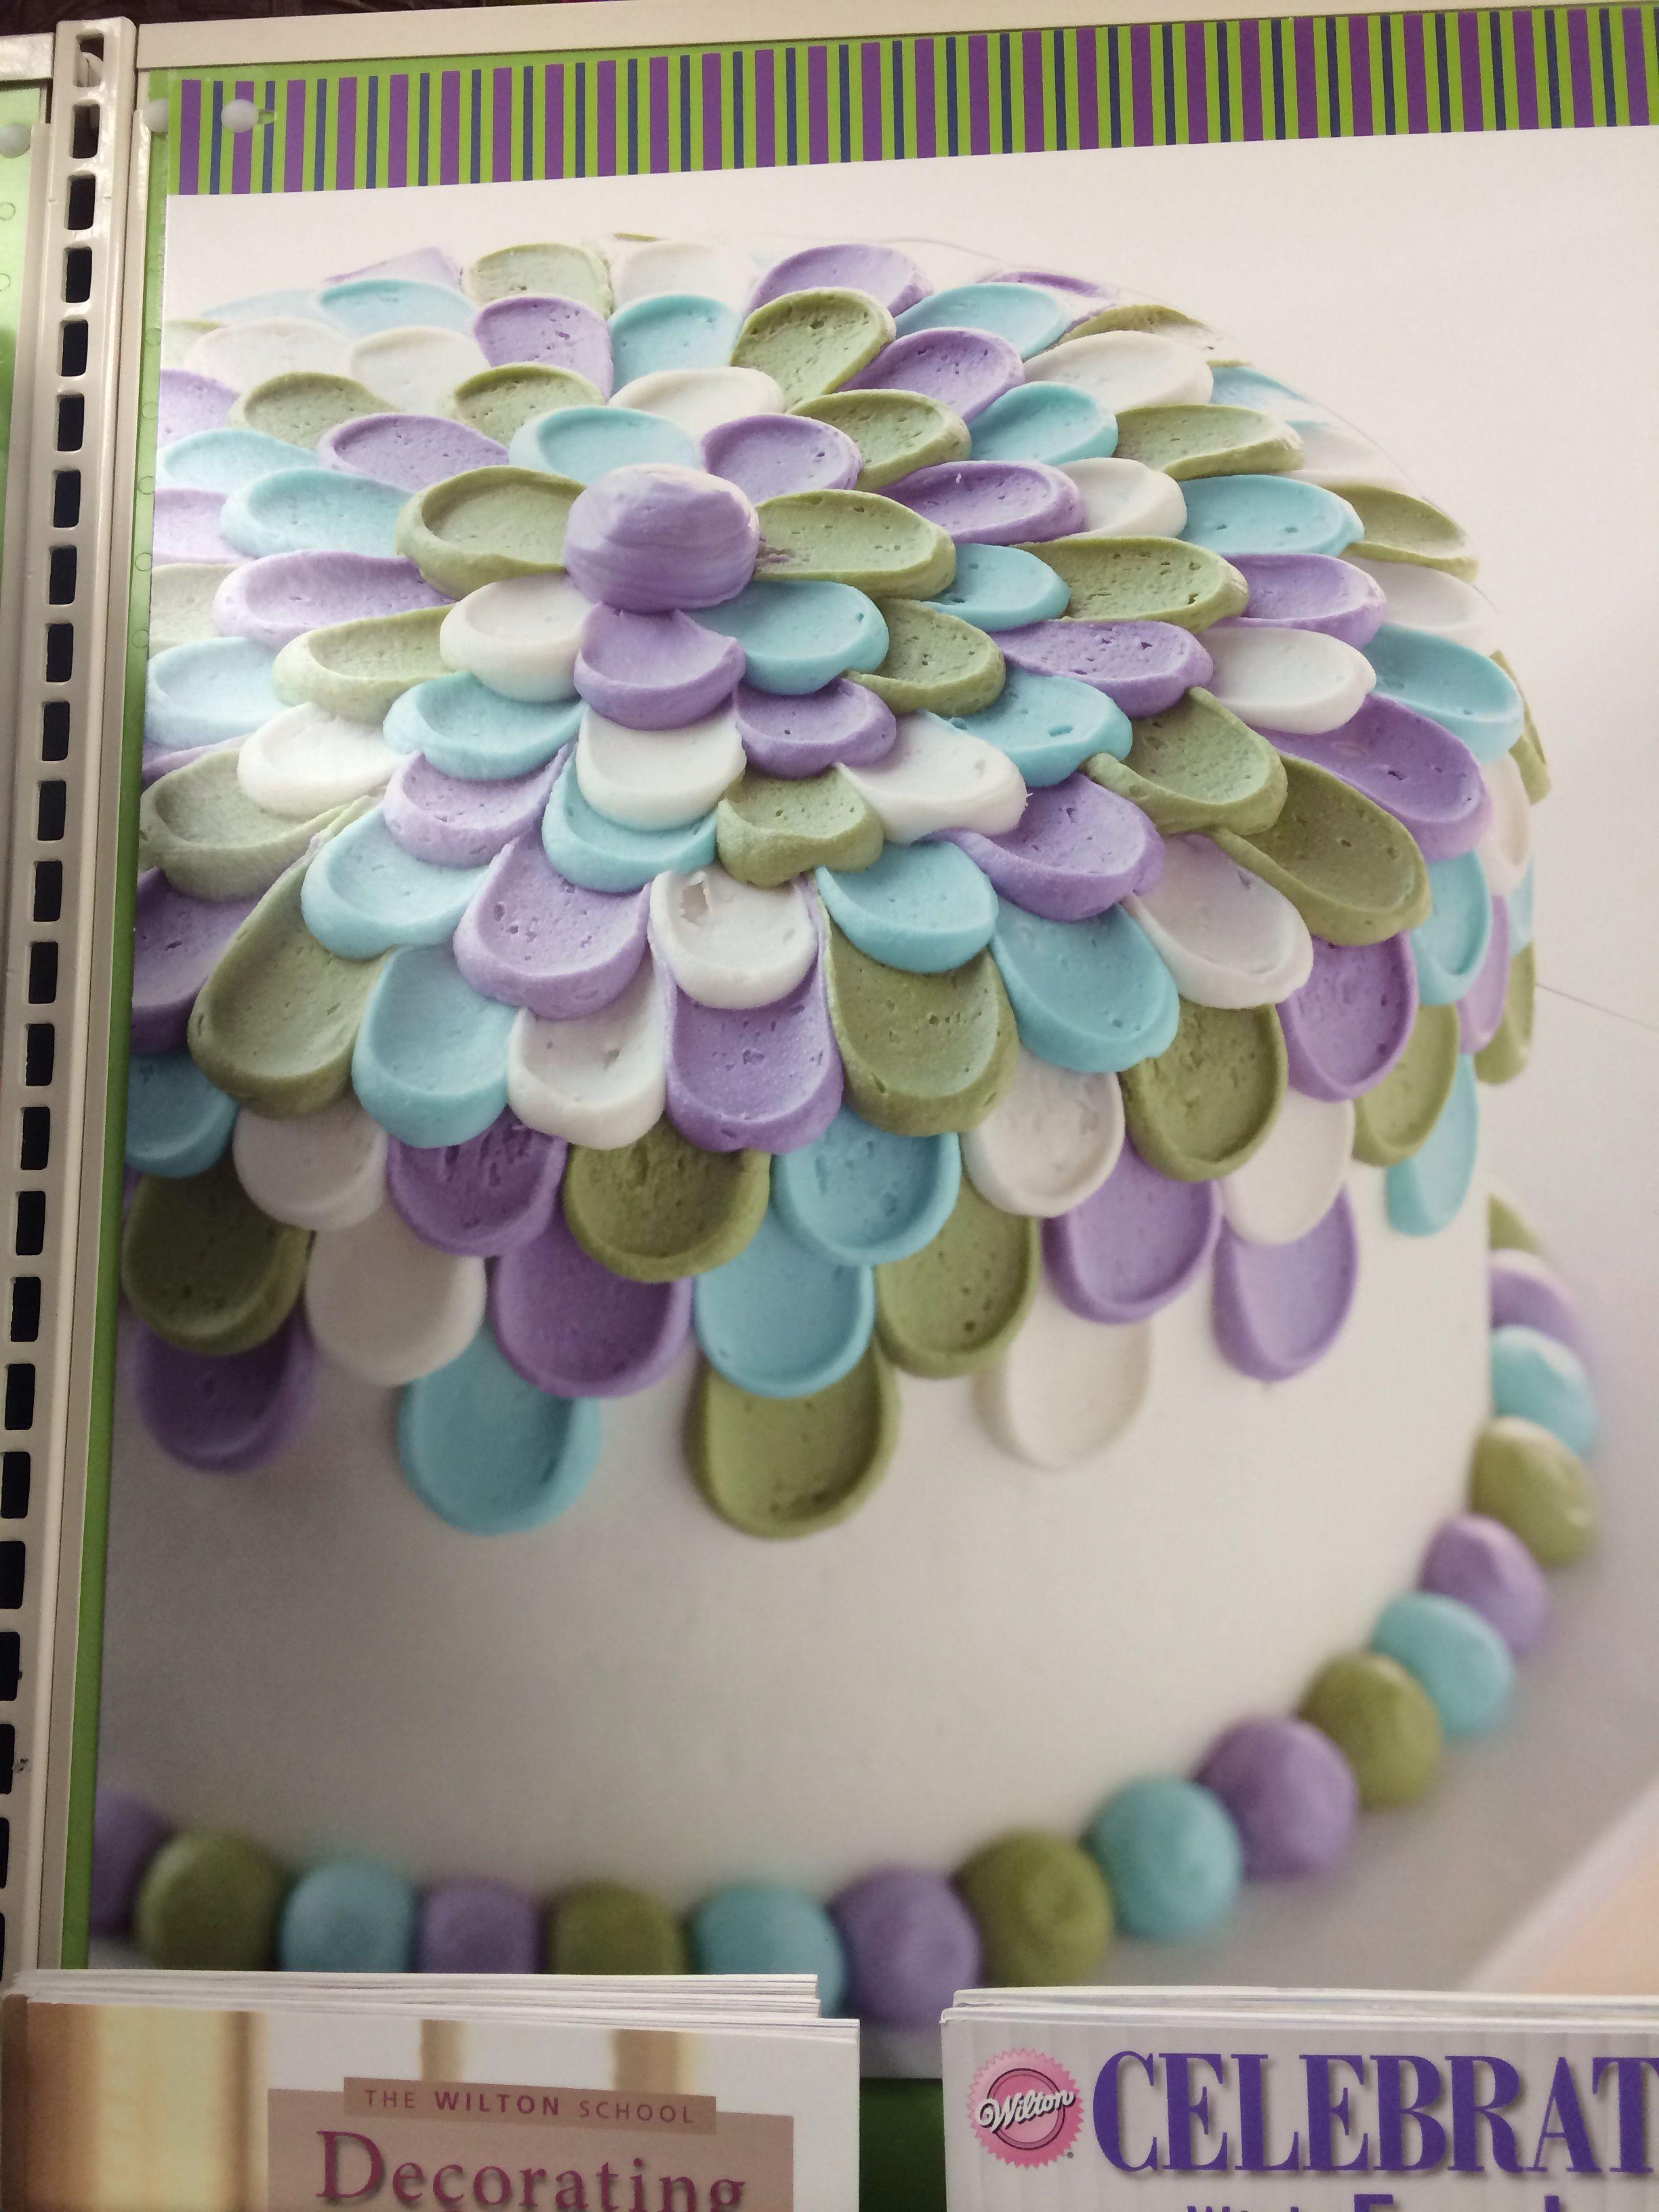 Wilton cake decorating Decorating with sweet goodness ...